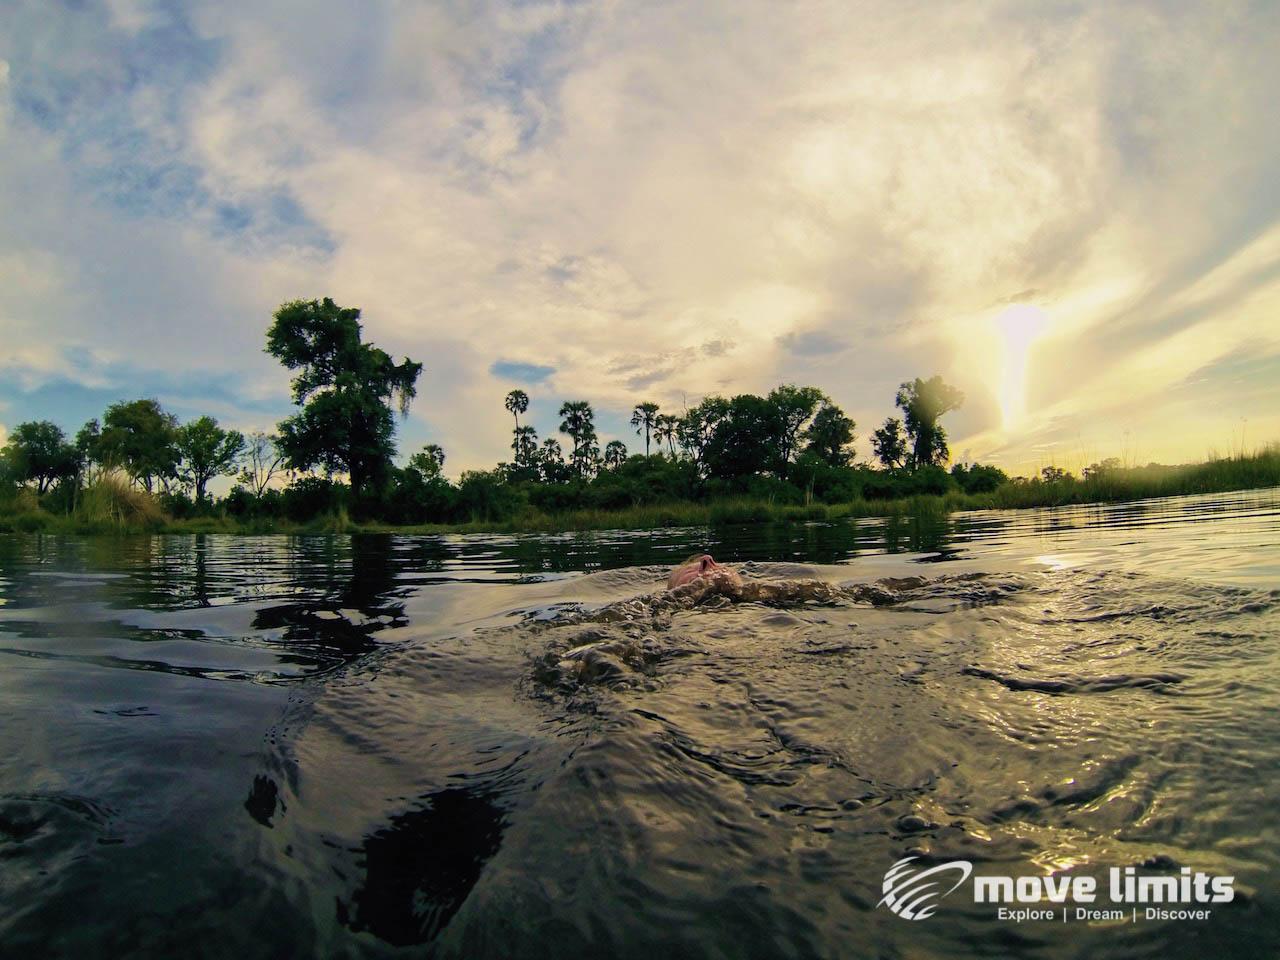 Zwei Tage im Delta des Okavango in Botswana - Schwimmen im Okavango - movelimits.de